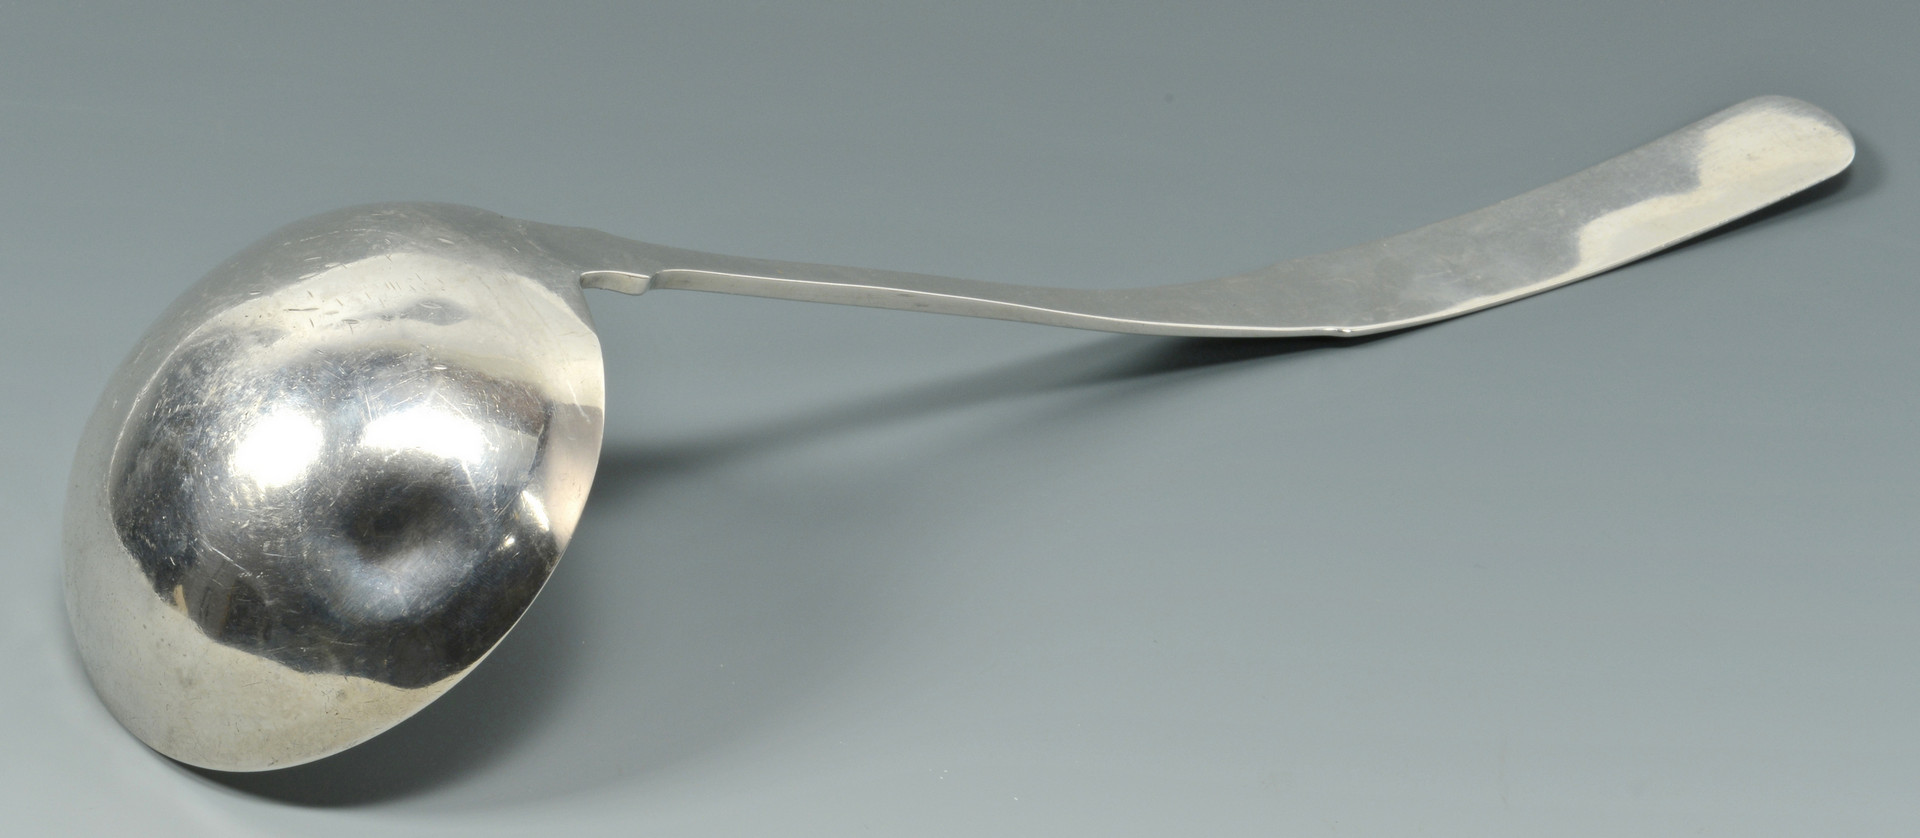 Lot 690: Misc. Silver Flatware, 24 pcs.